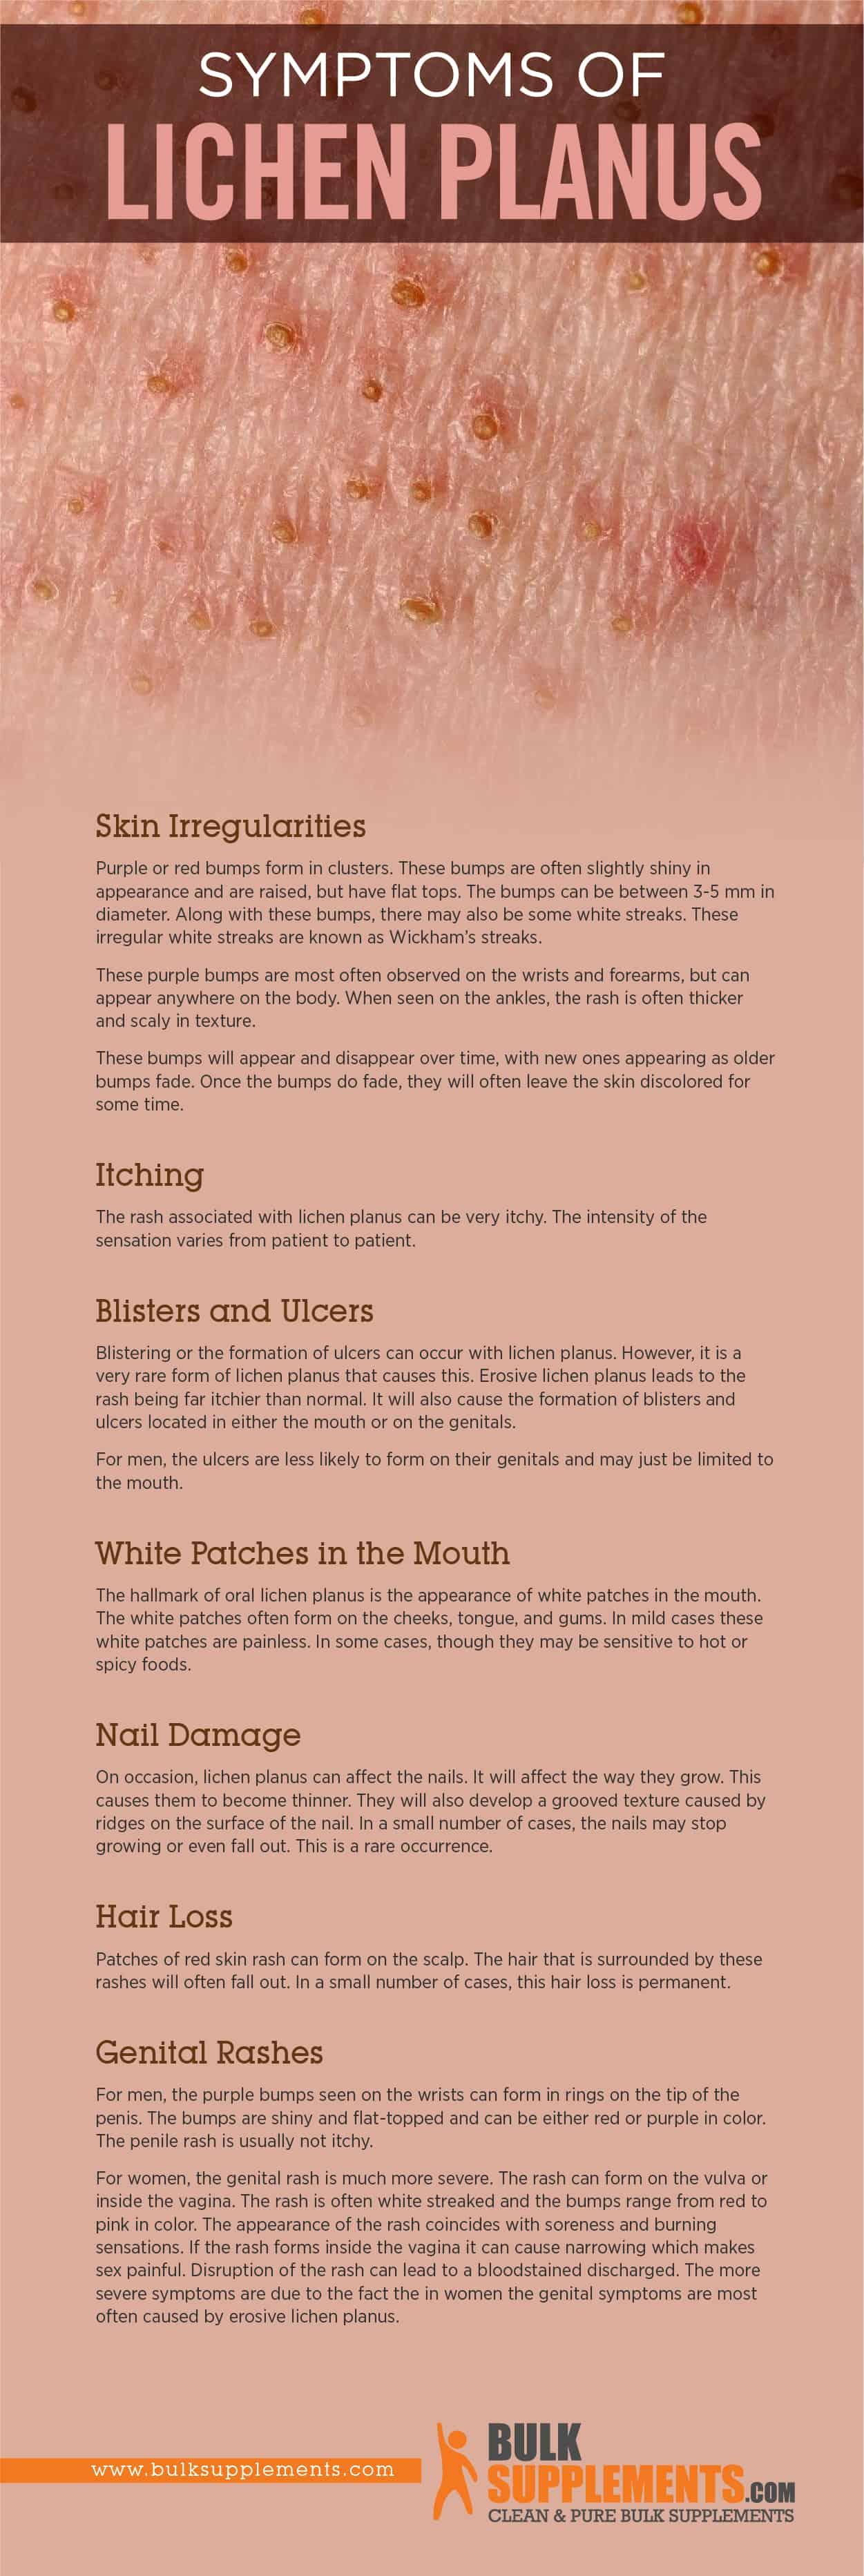 Lichen Planus Symptoms